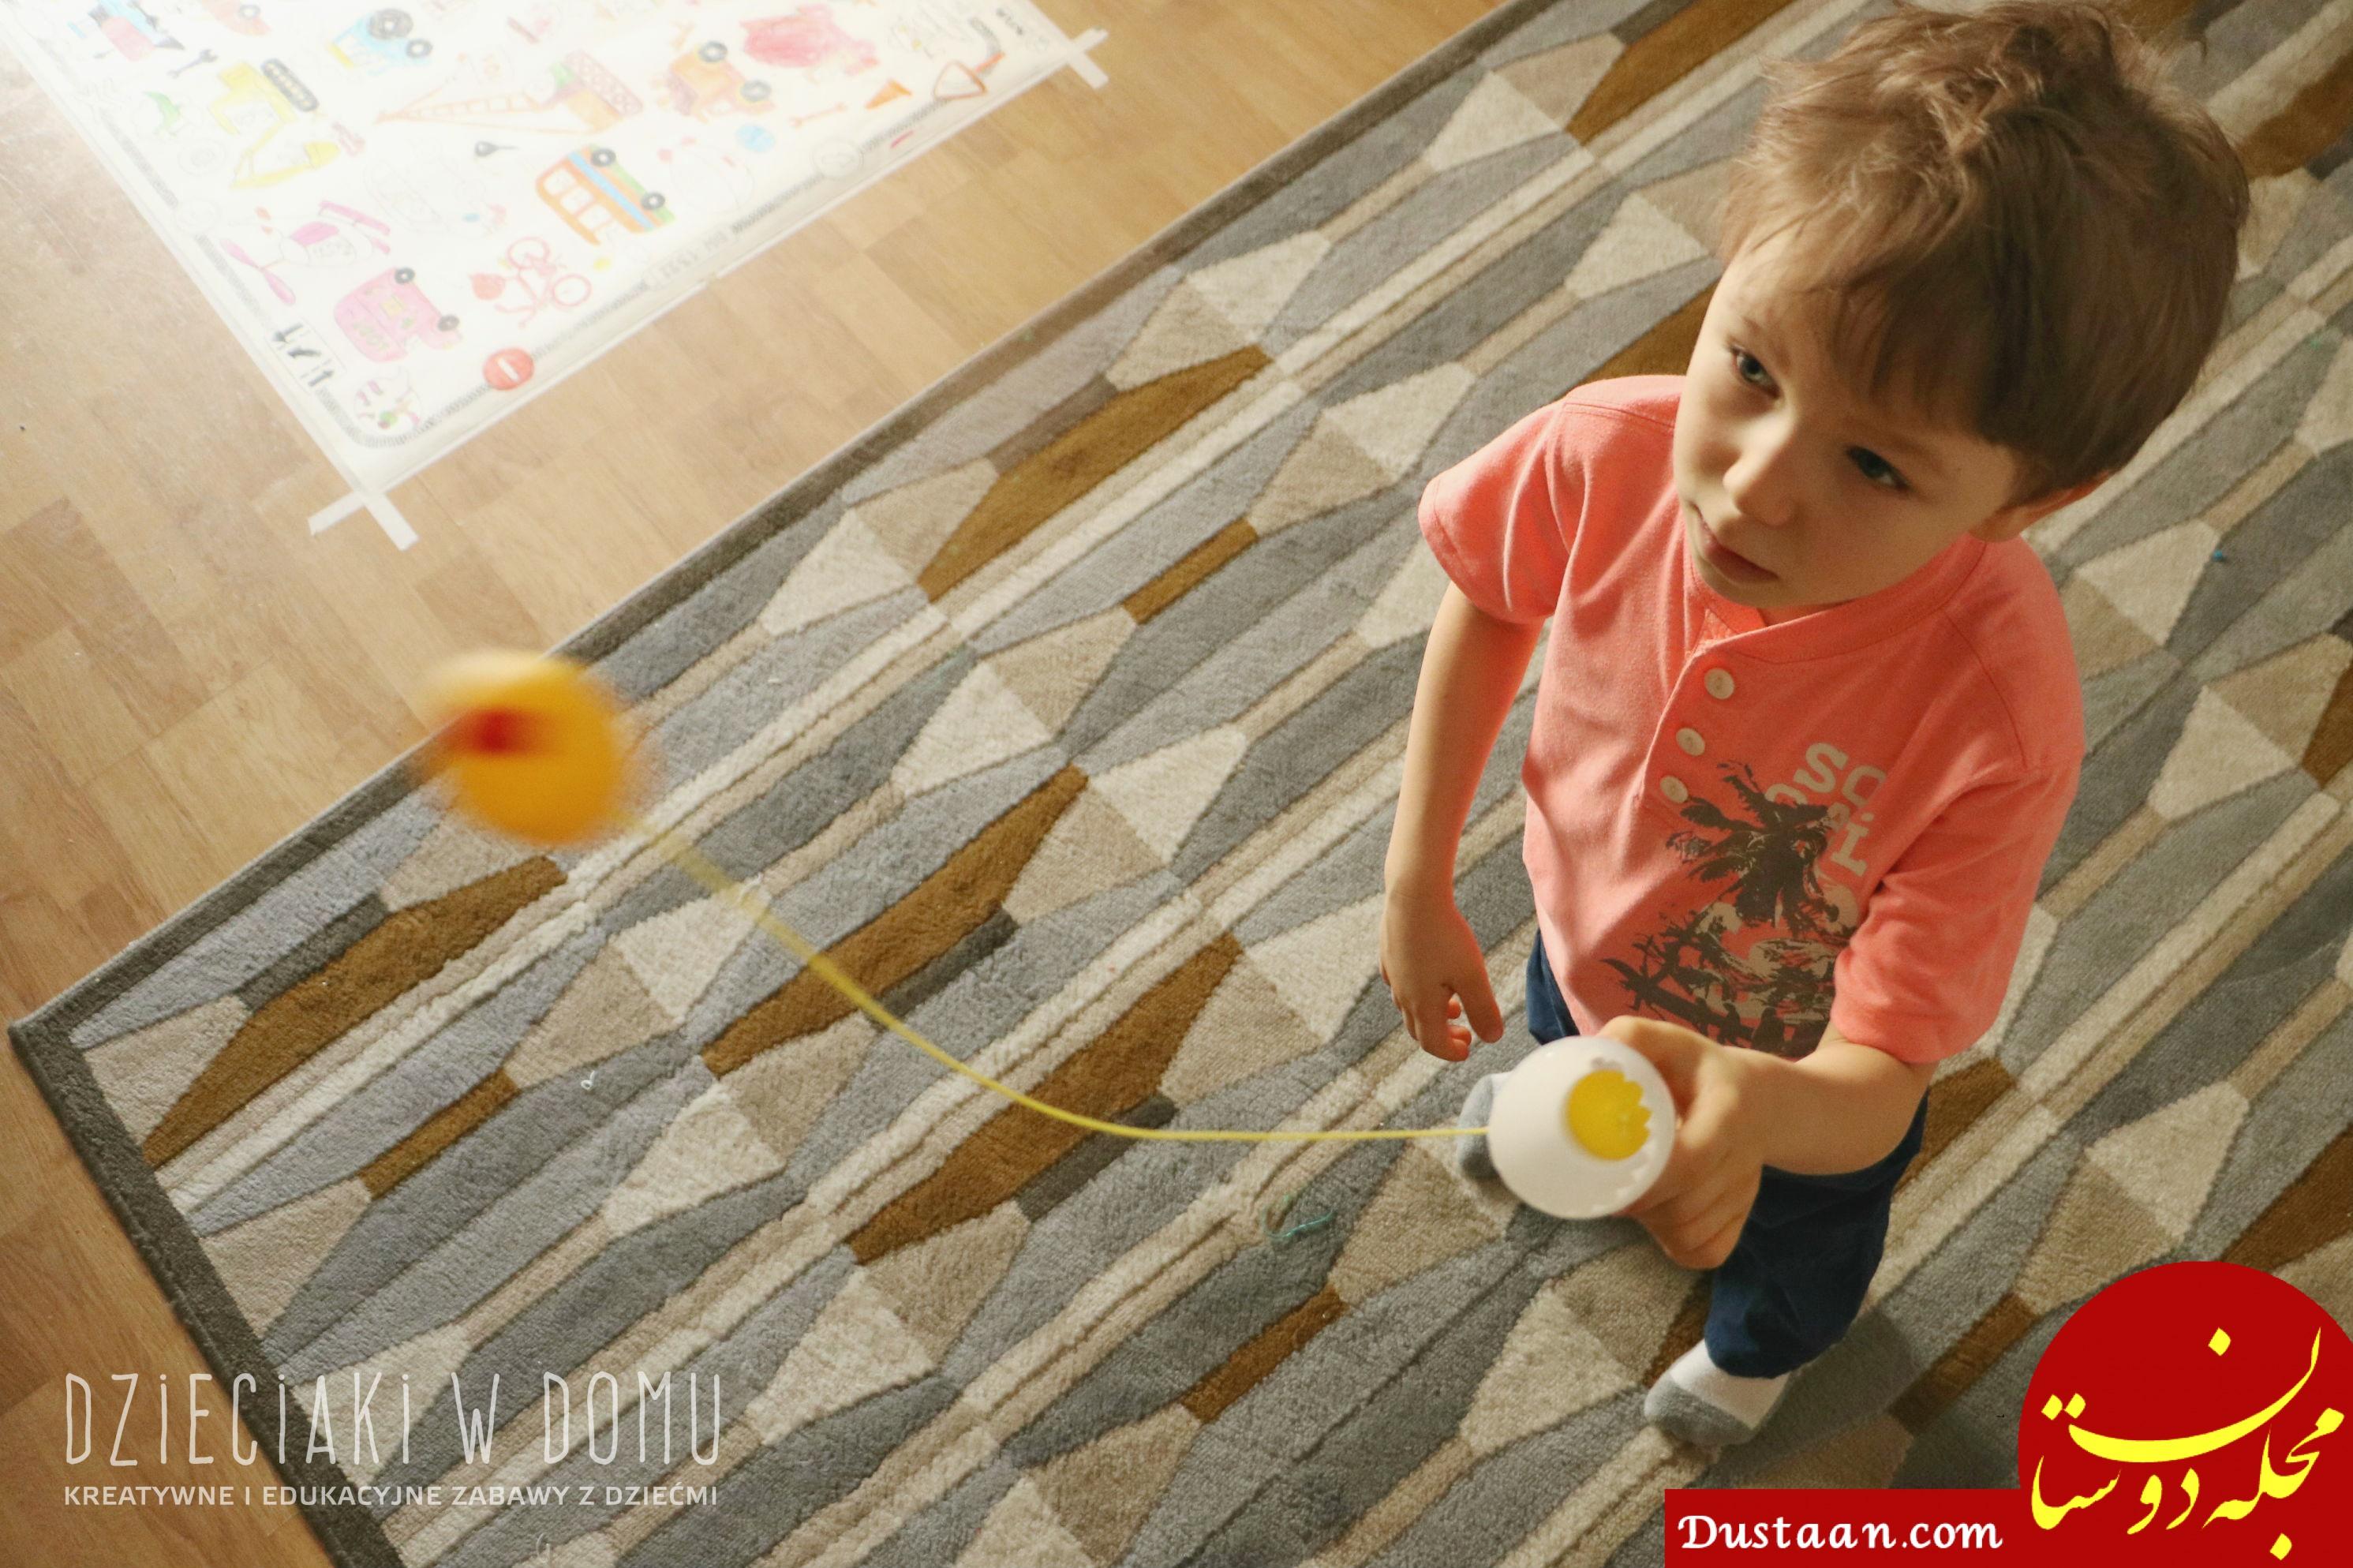 www.dustaan.com کاردستی با وسایل دور ریختنی برای مدرسه و تفریح +عکس وفیلم